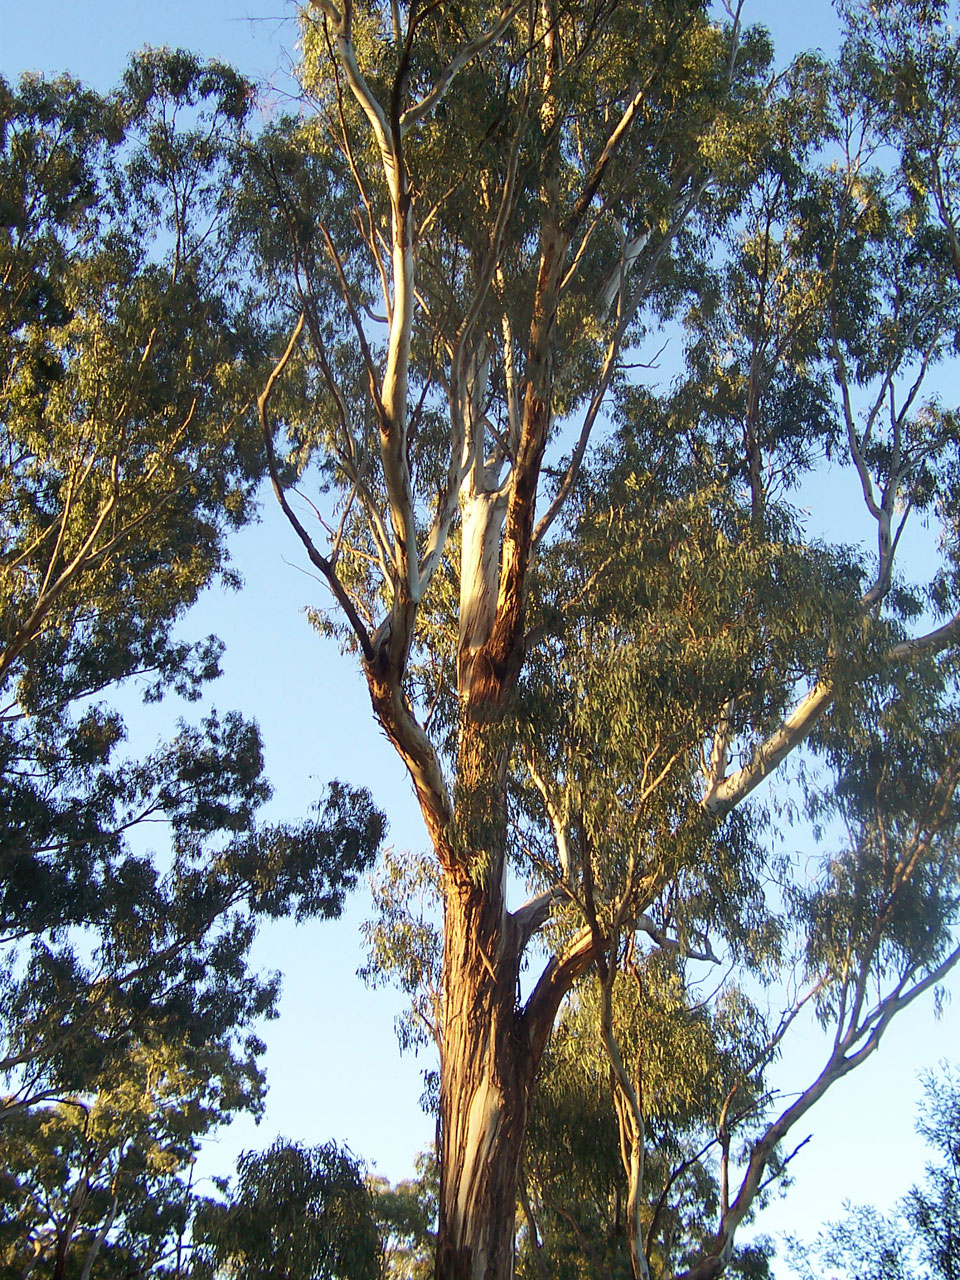 Eucalyptus tree eucalyptus simple english wikipedia the free